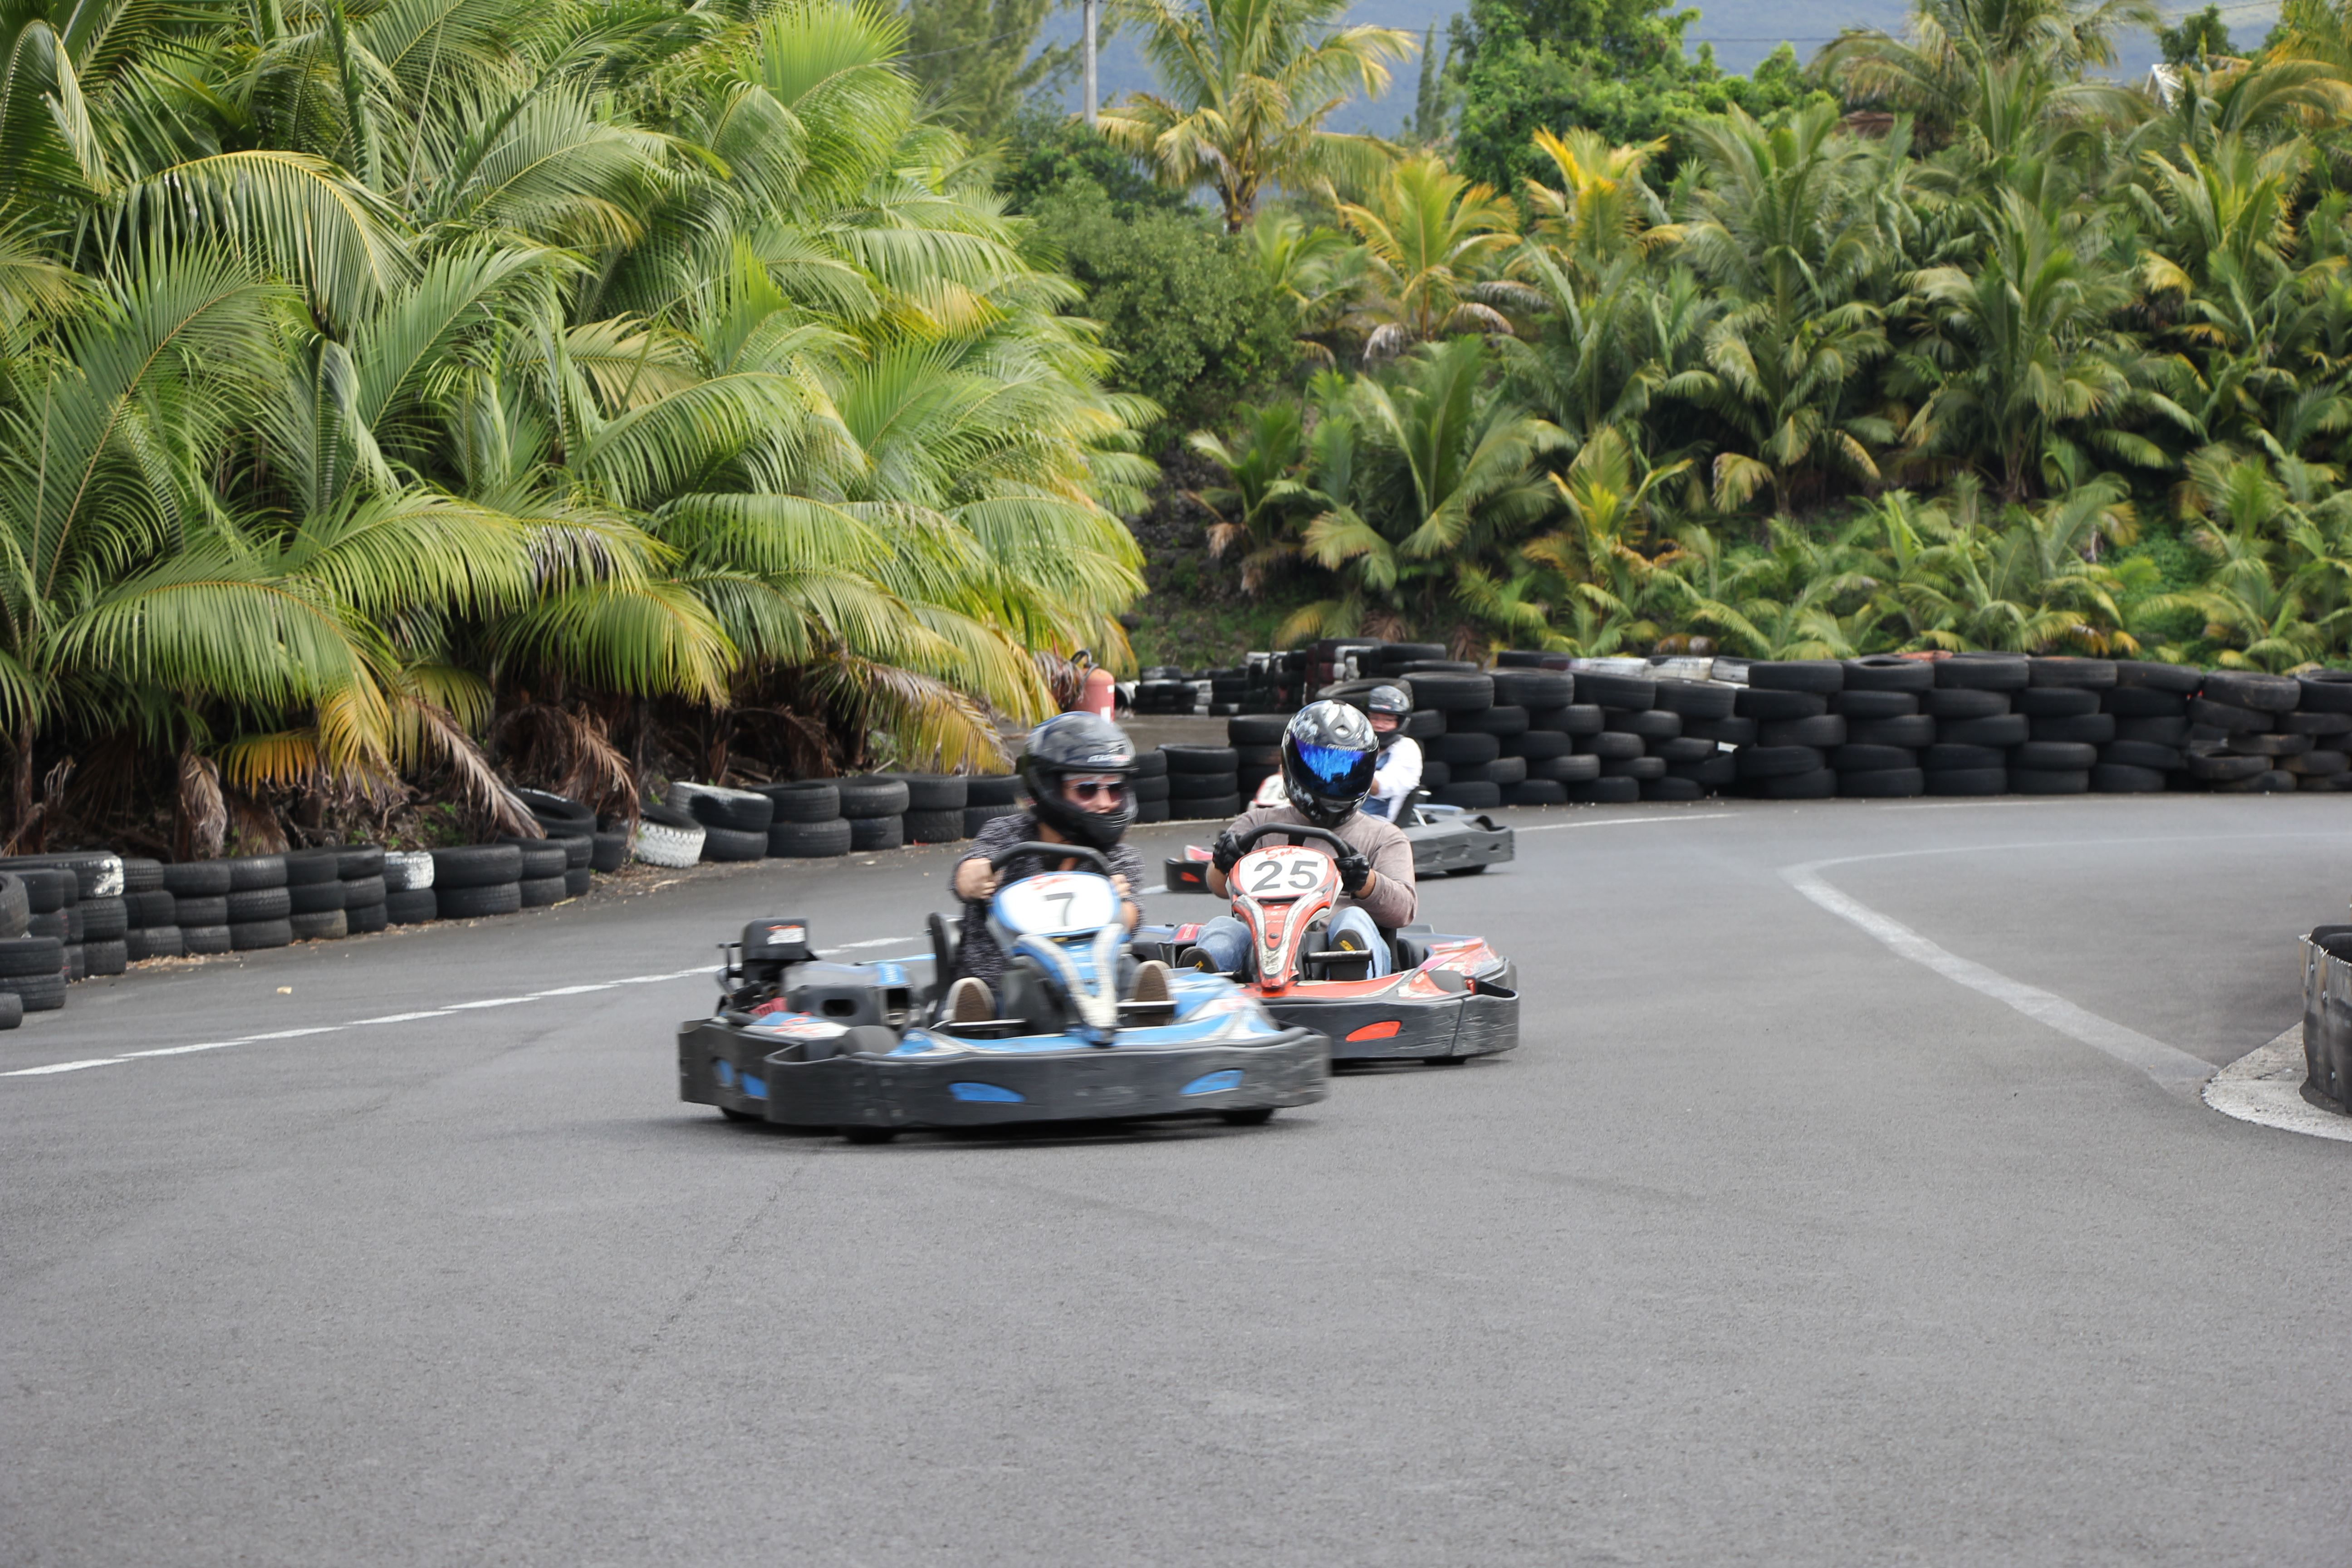 5,4,3,2,1... Go ! Challenge karting